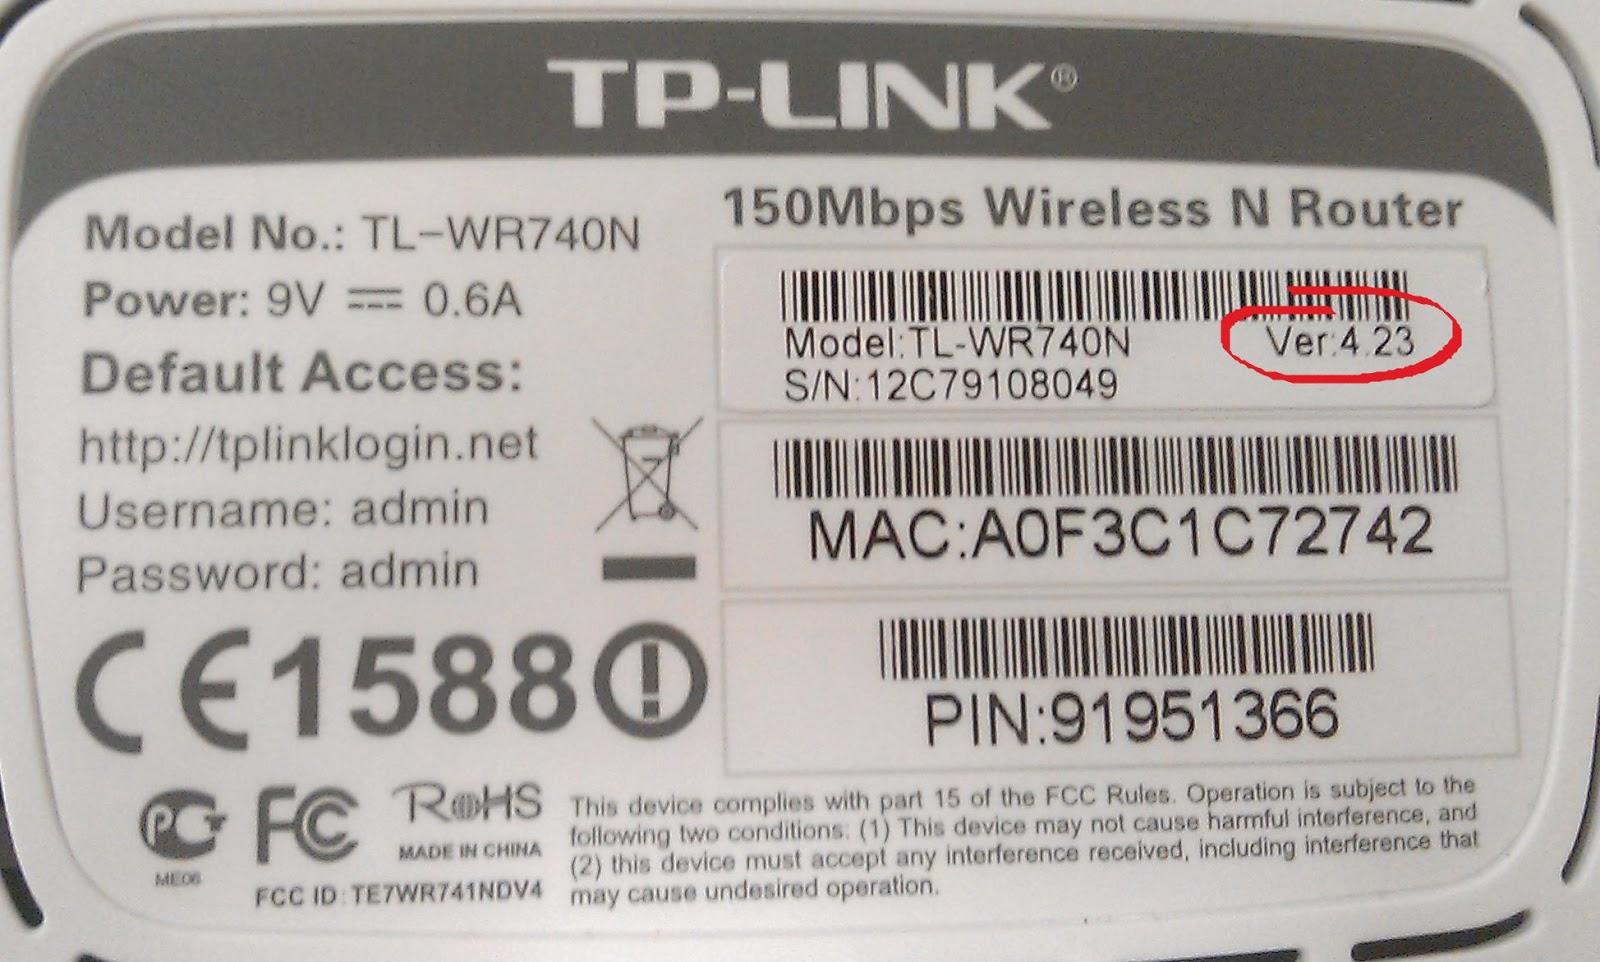 Electronics FAQ: HelloWorld on TP-LINK TL-WR740N